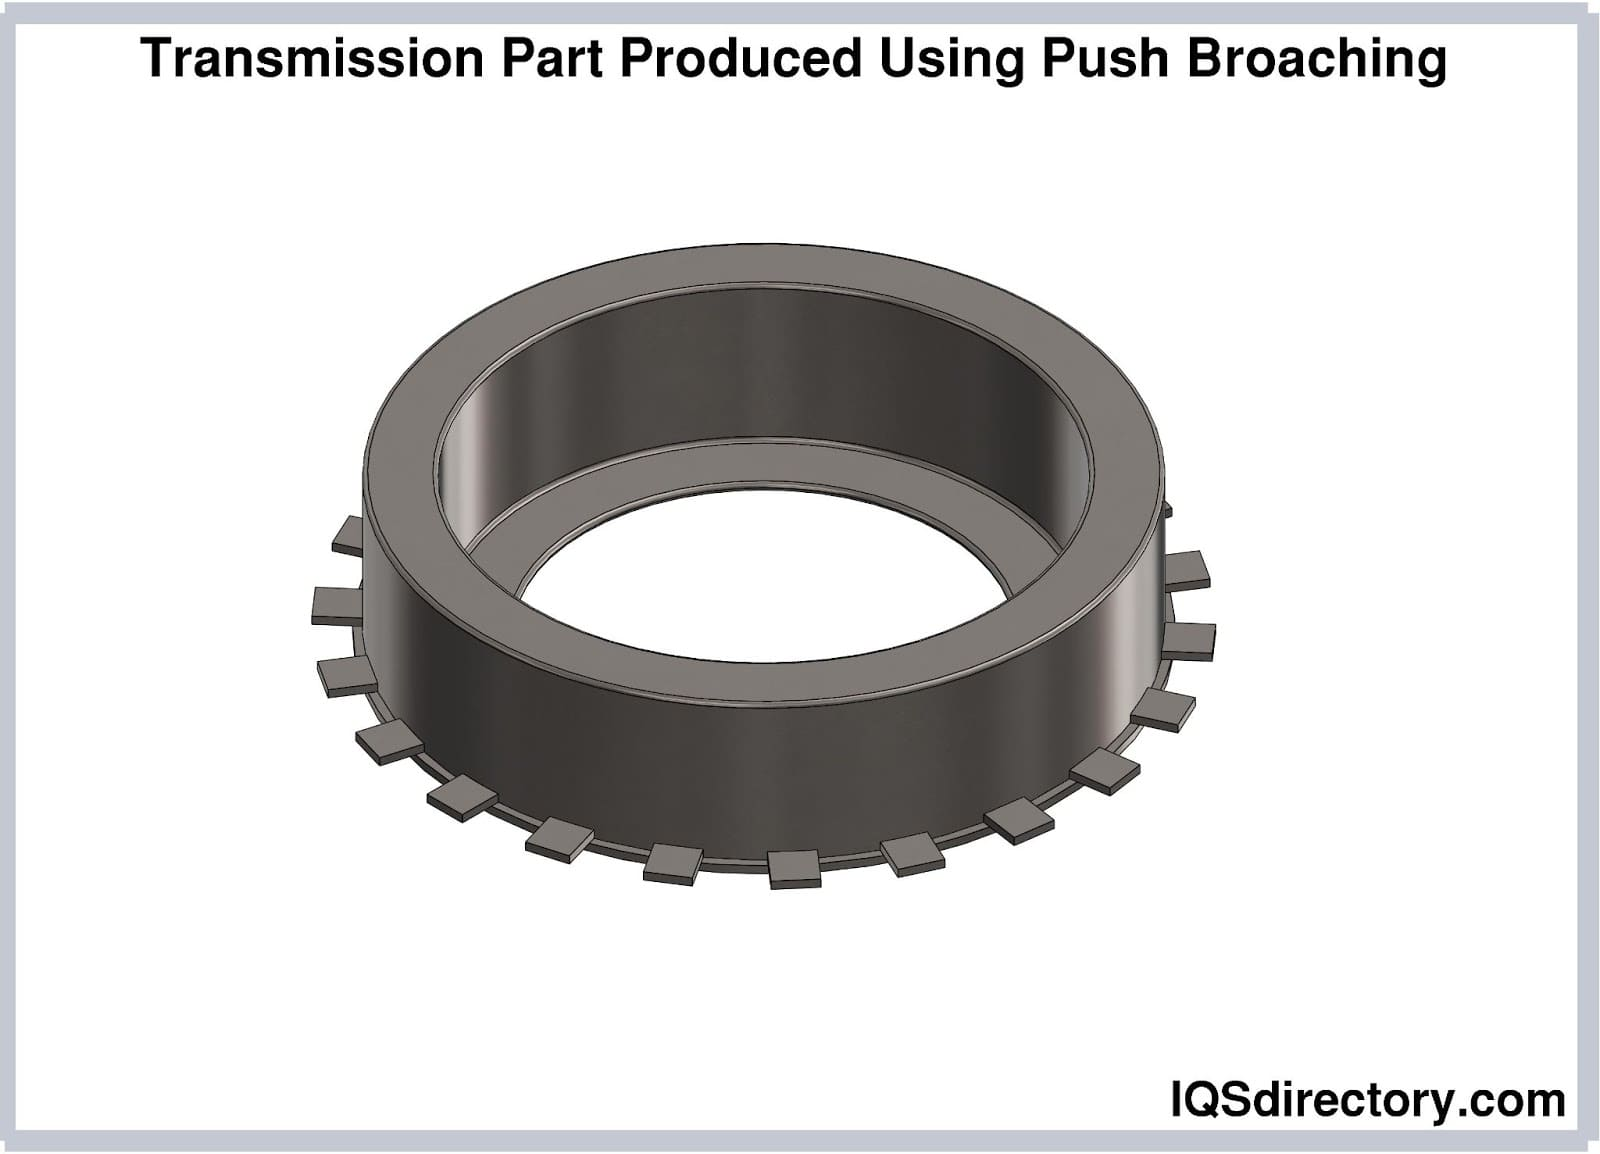 Transmission Part Produced Using Push Broaching